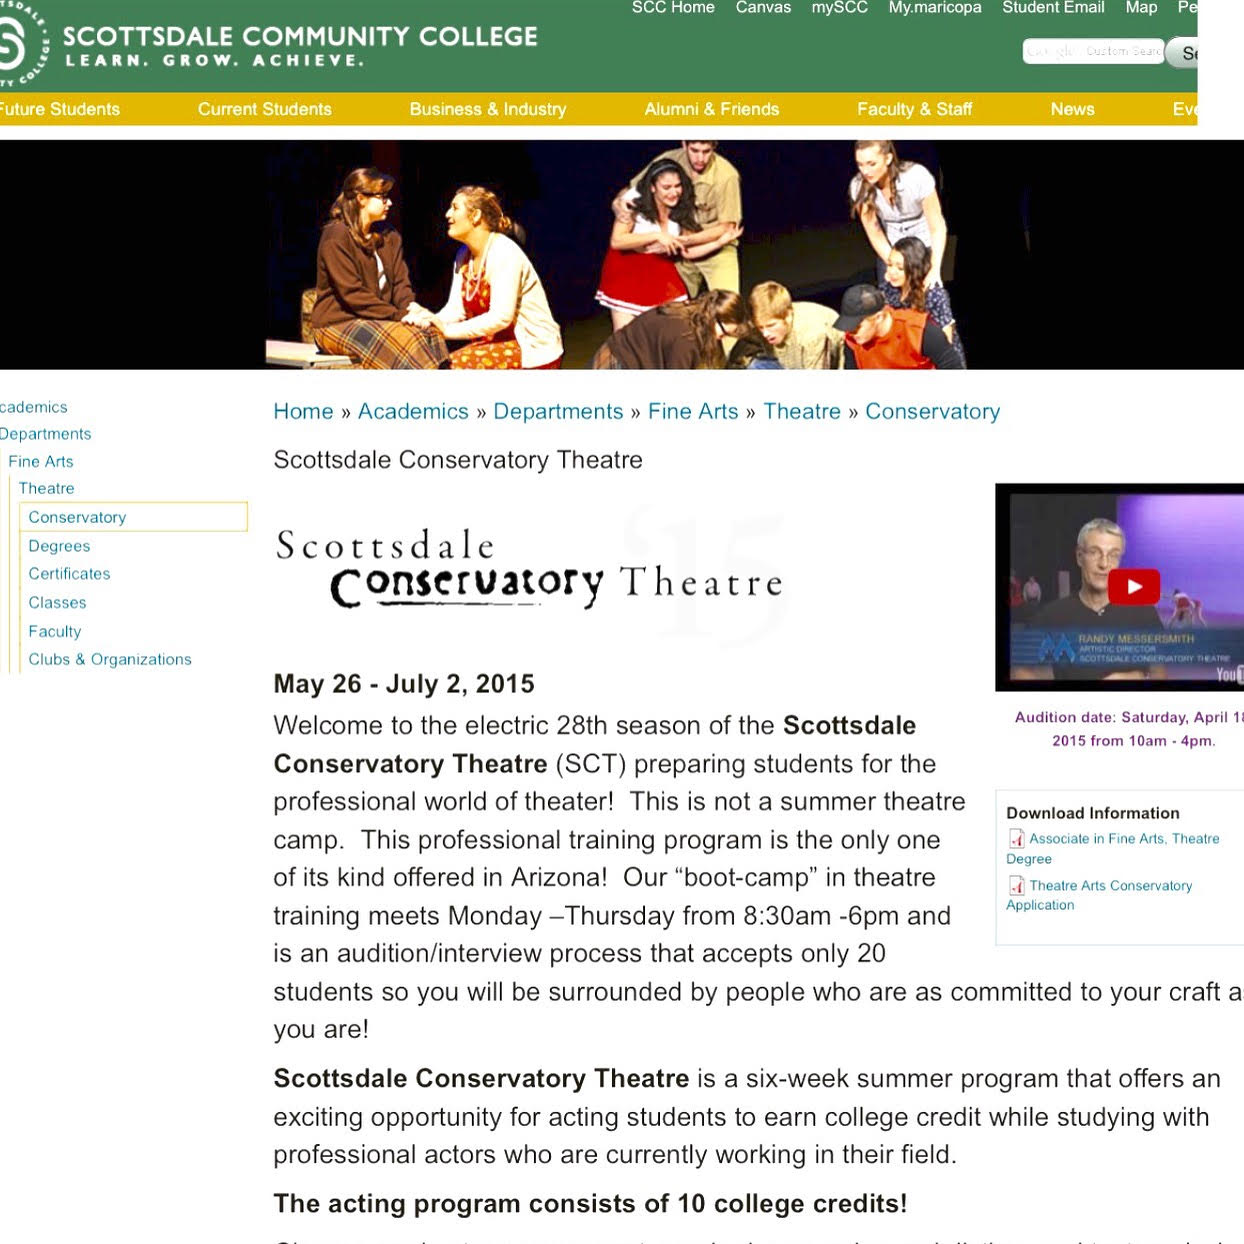 Scottsdale Conservatory Theatre